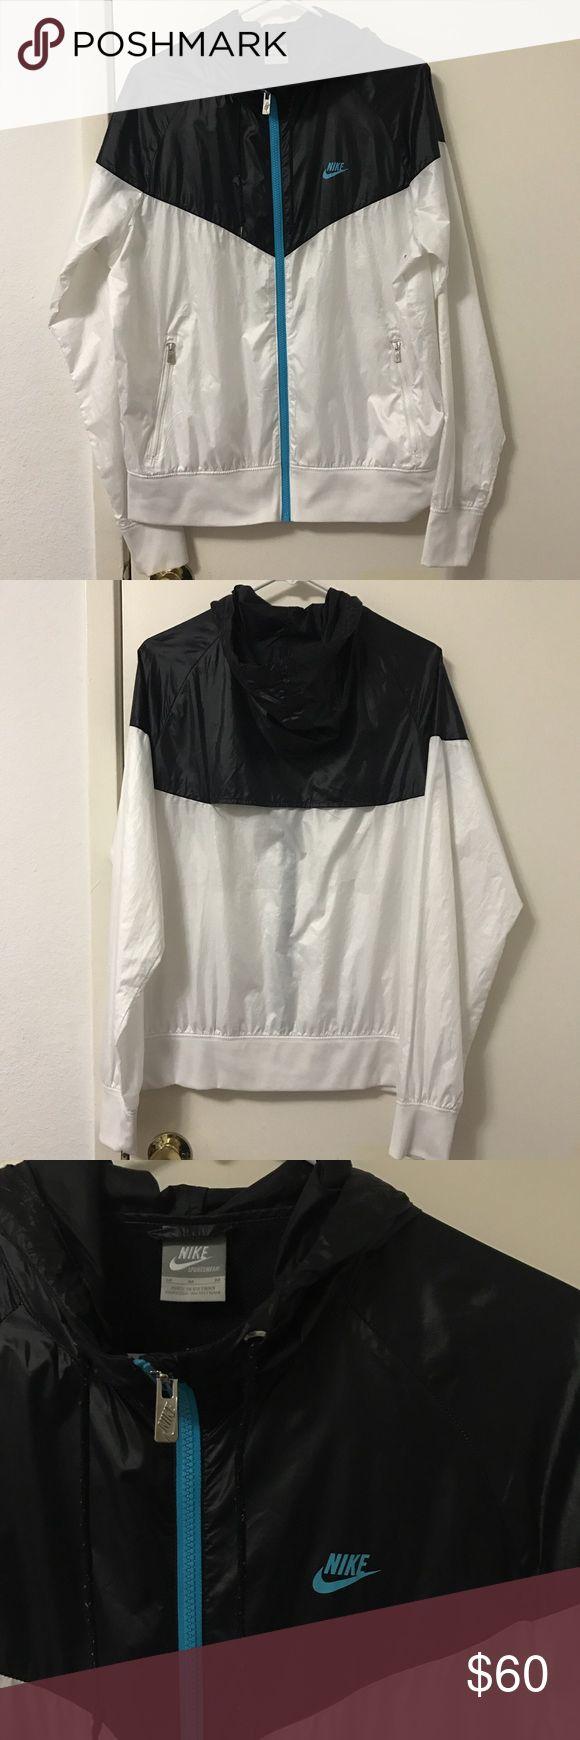 Nike windrunner jacket Vintage Nike windrunner jacket / Black and white with blue detailing /  Size medium / tiny flaws: a bit dirty on the inside hem / #nike #nikejacket #windbreaker #windrunner #sportswear Nike Jackets & Coats Windbreakers